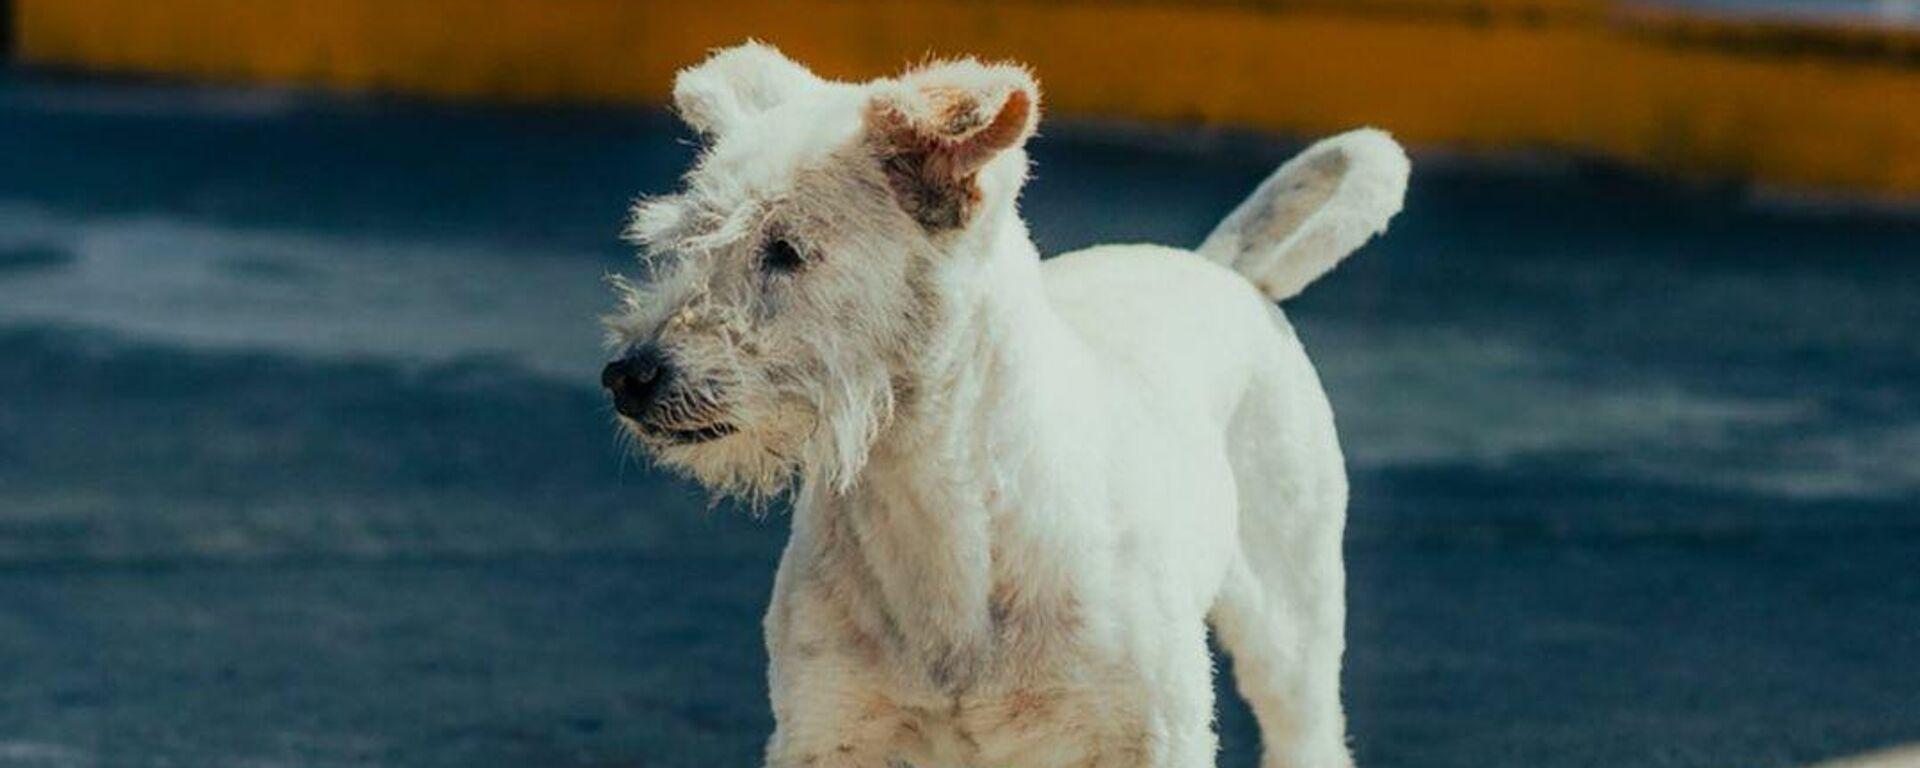 Gasolín, el perro 'influencer' que trabaja en una gasolinera mexicana - Sputnik Mundo, 1920, 09.09.2021